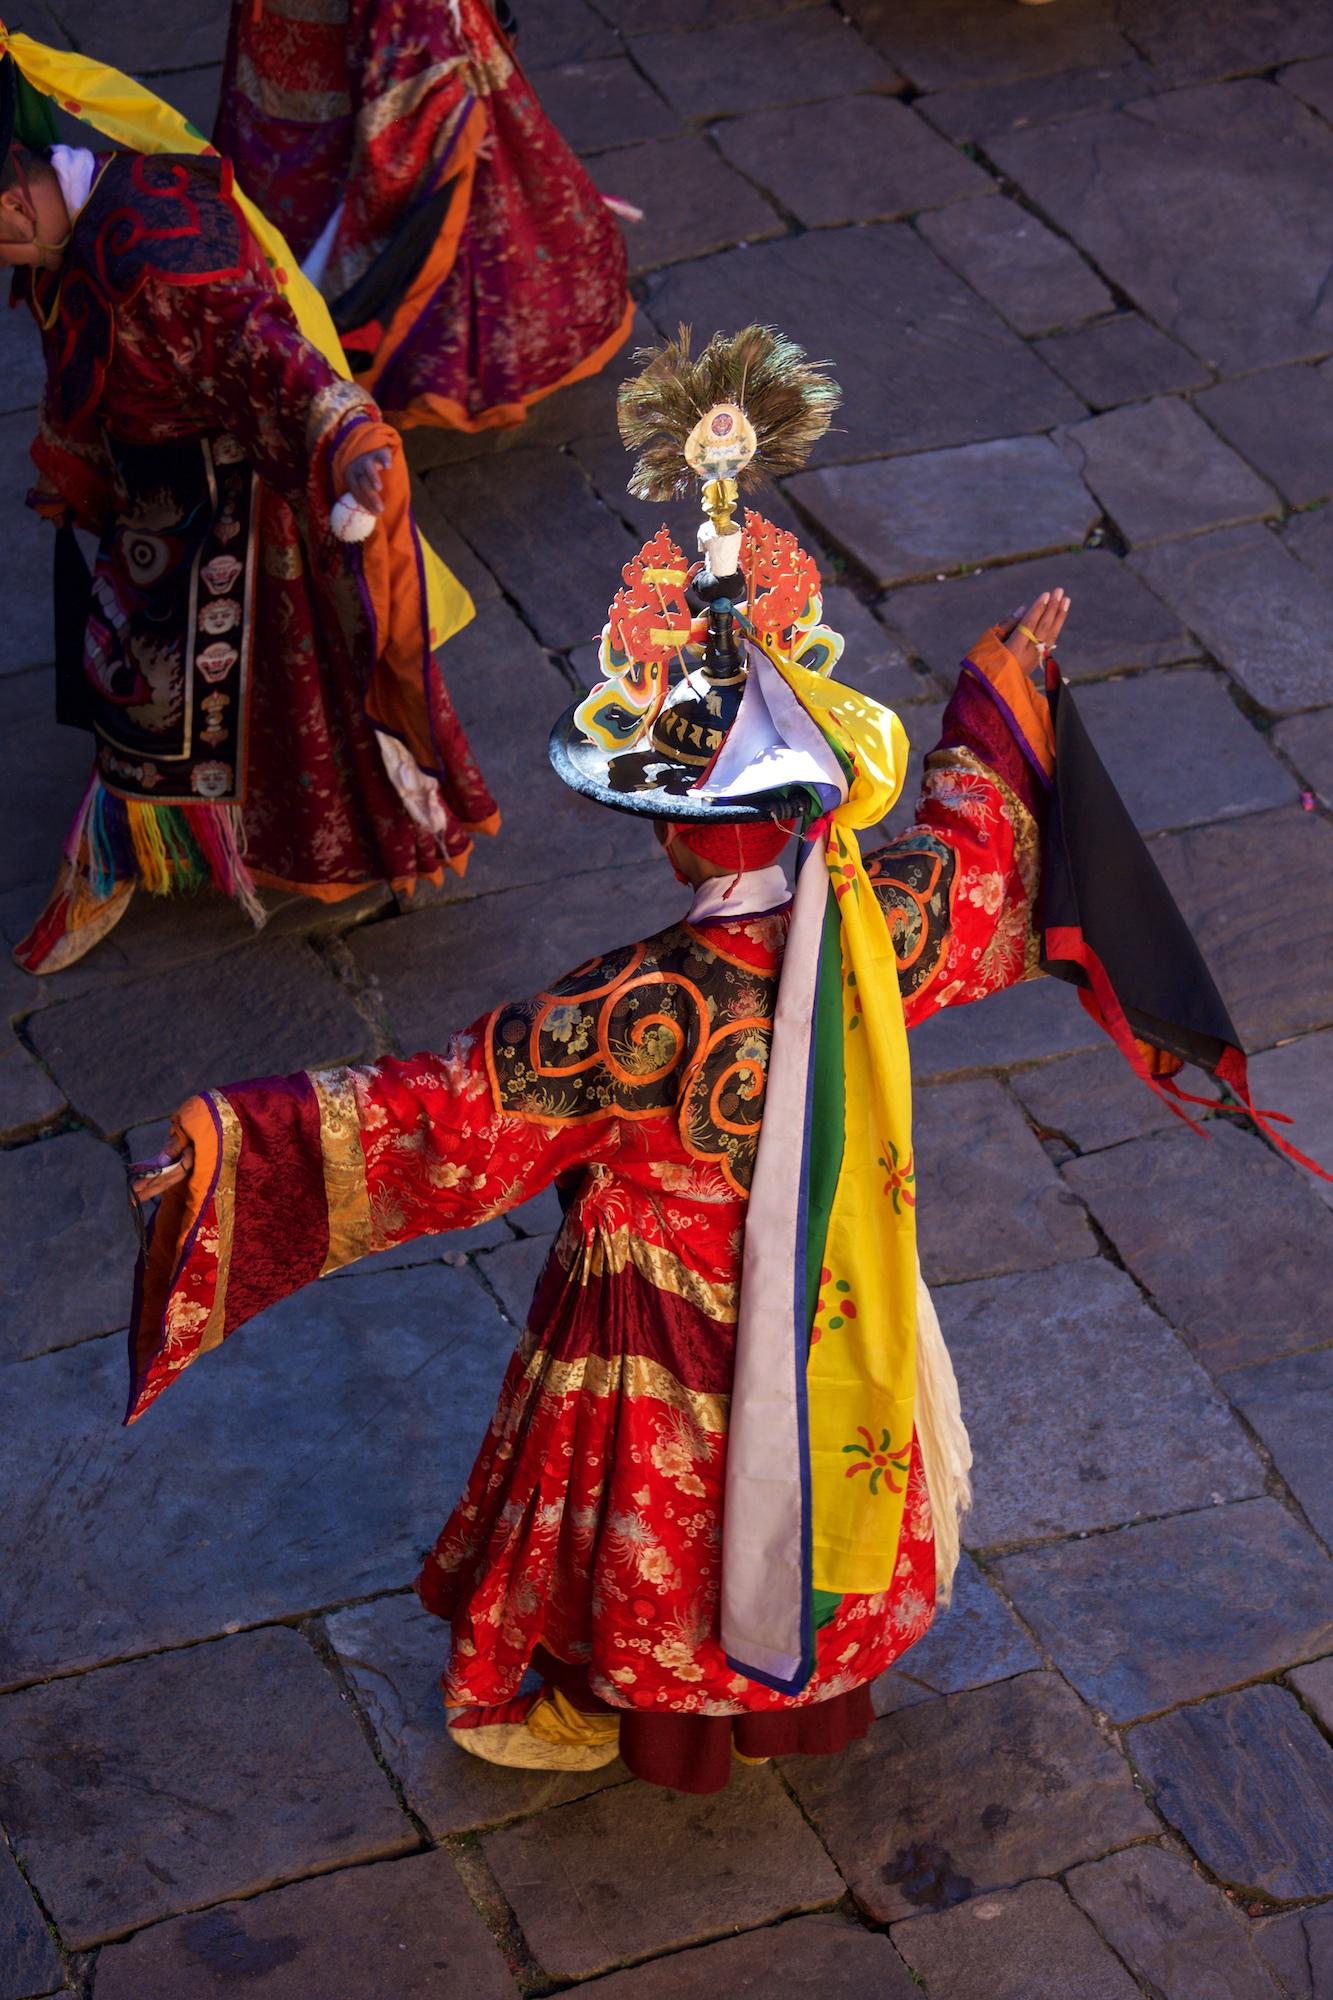 Bhutan-2016- C26O8613.jpg